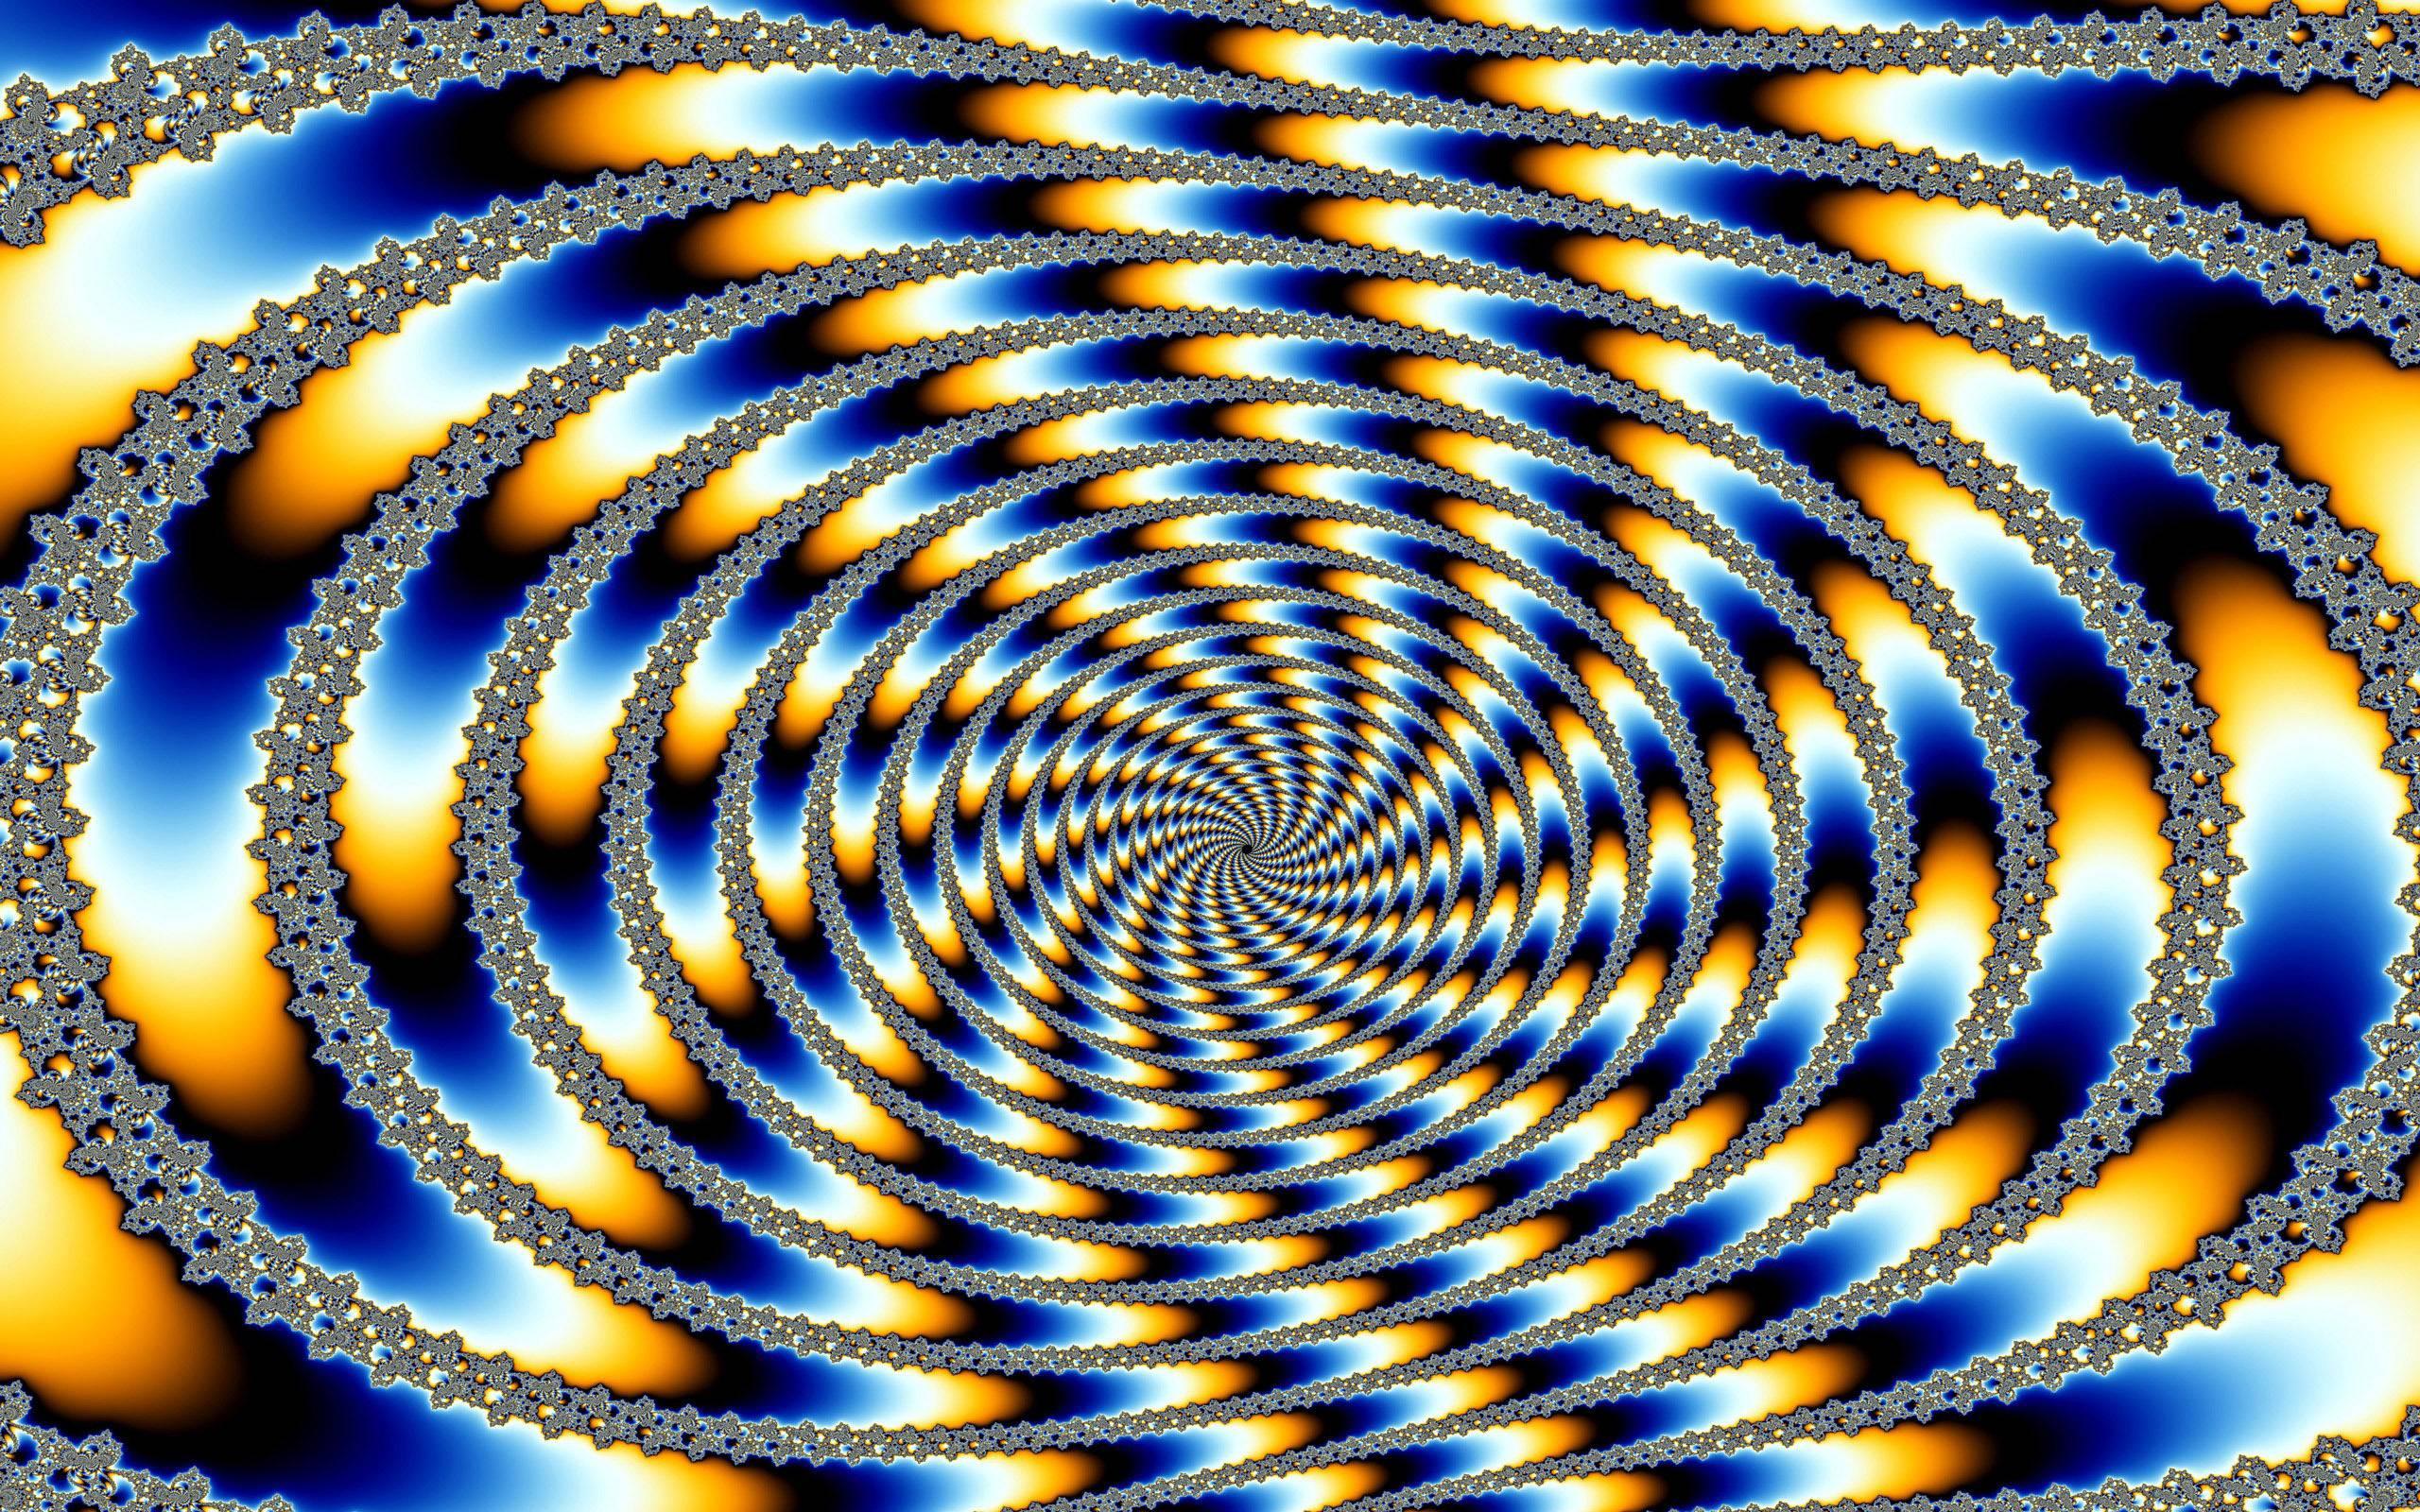 hypnosis moving wallpaper hypnotic - photo #17